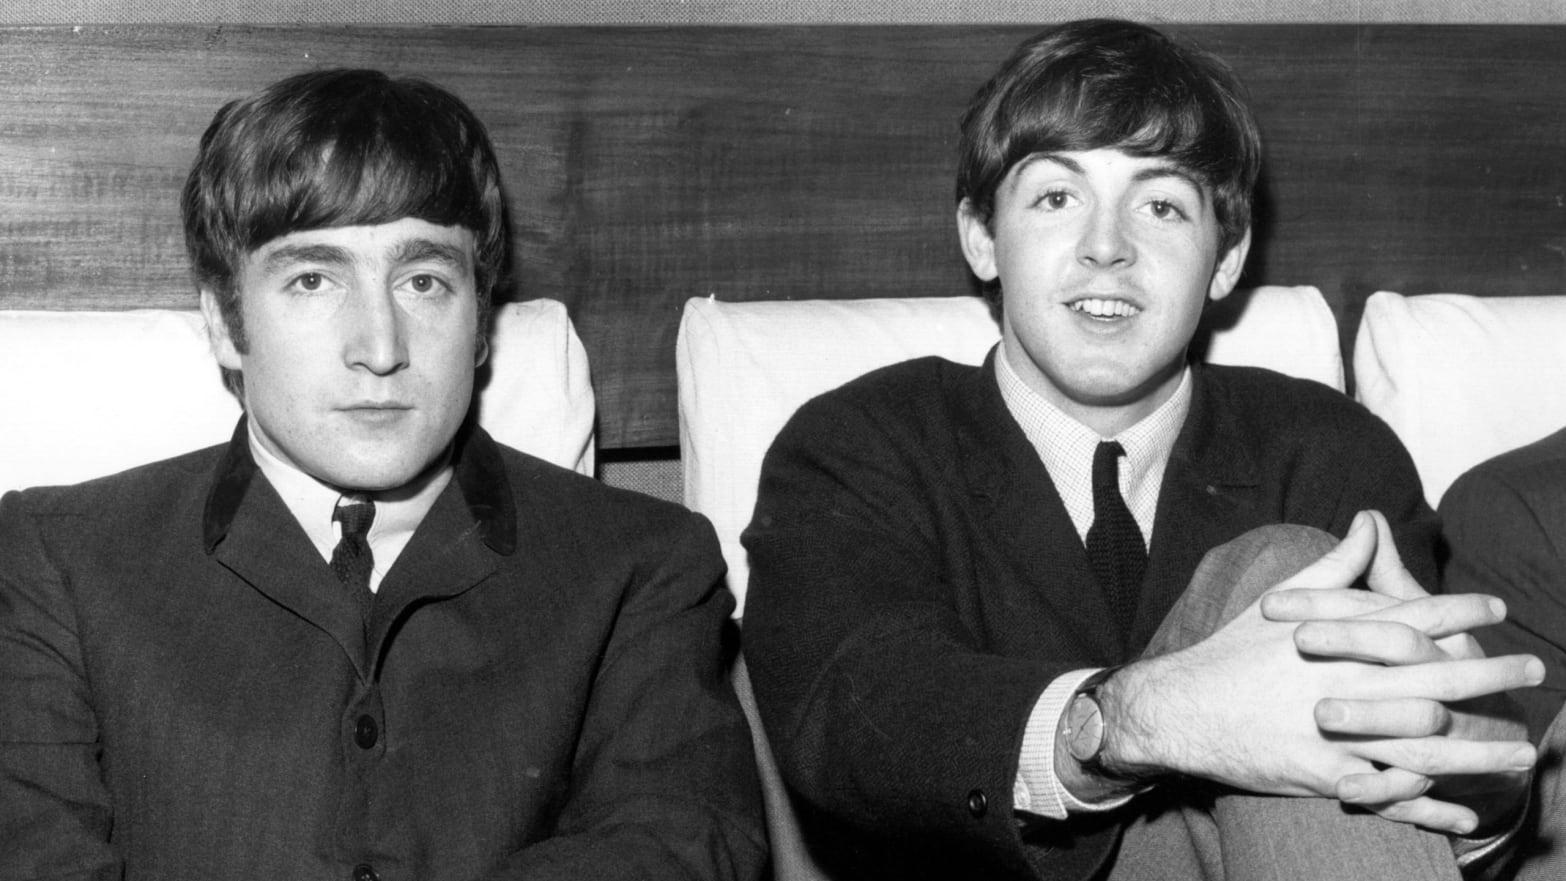 The Day John Lennon Met Paul Mccartney And Changed Music